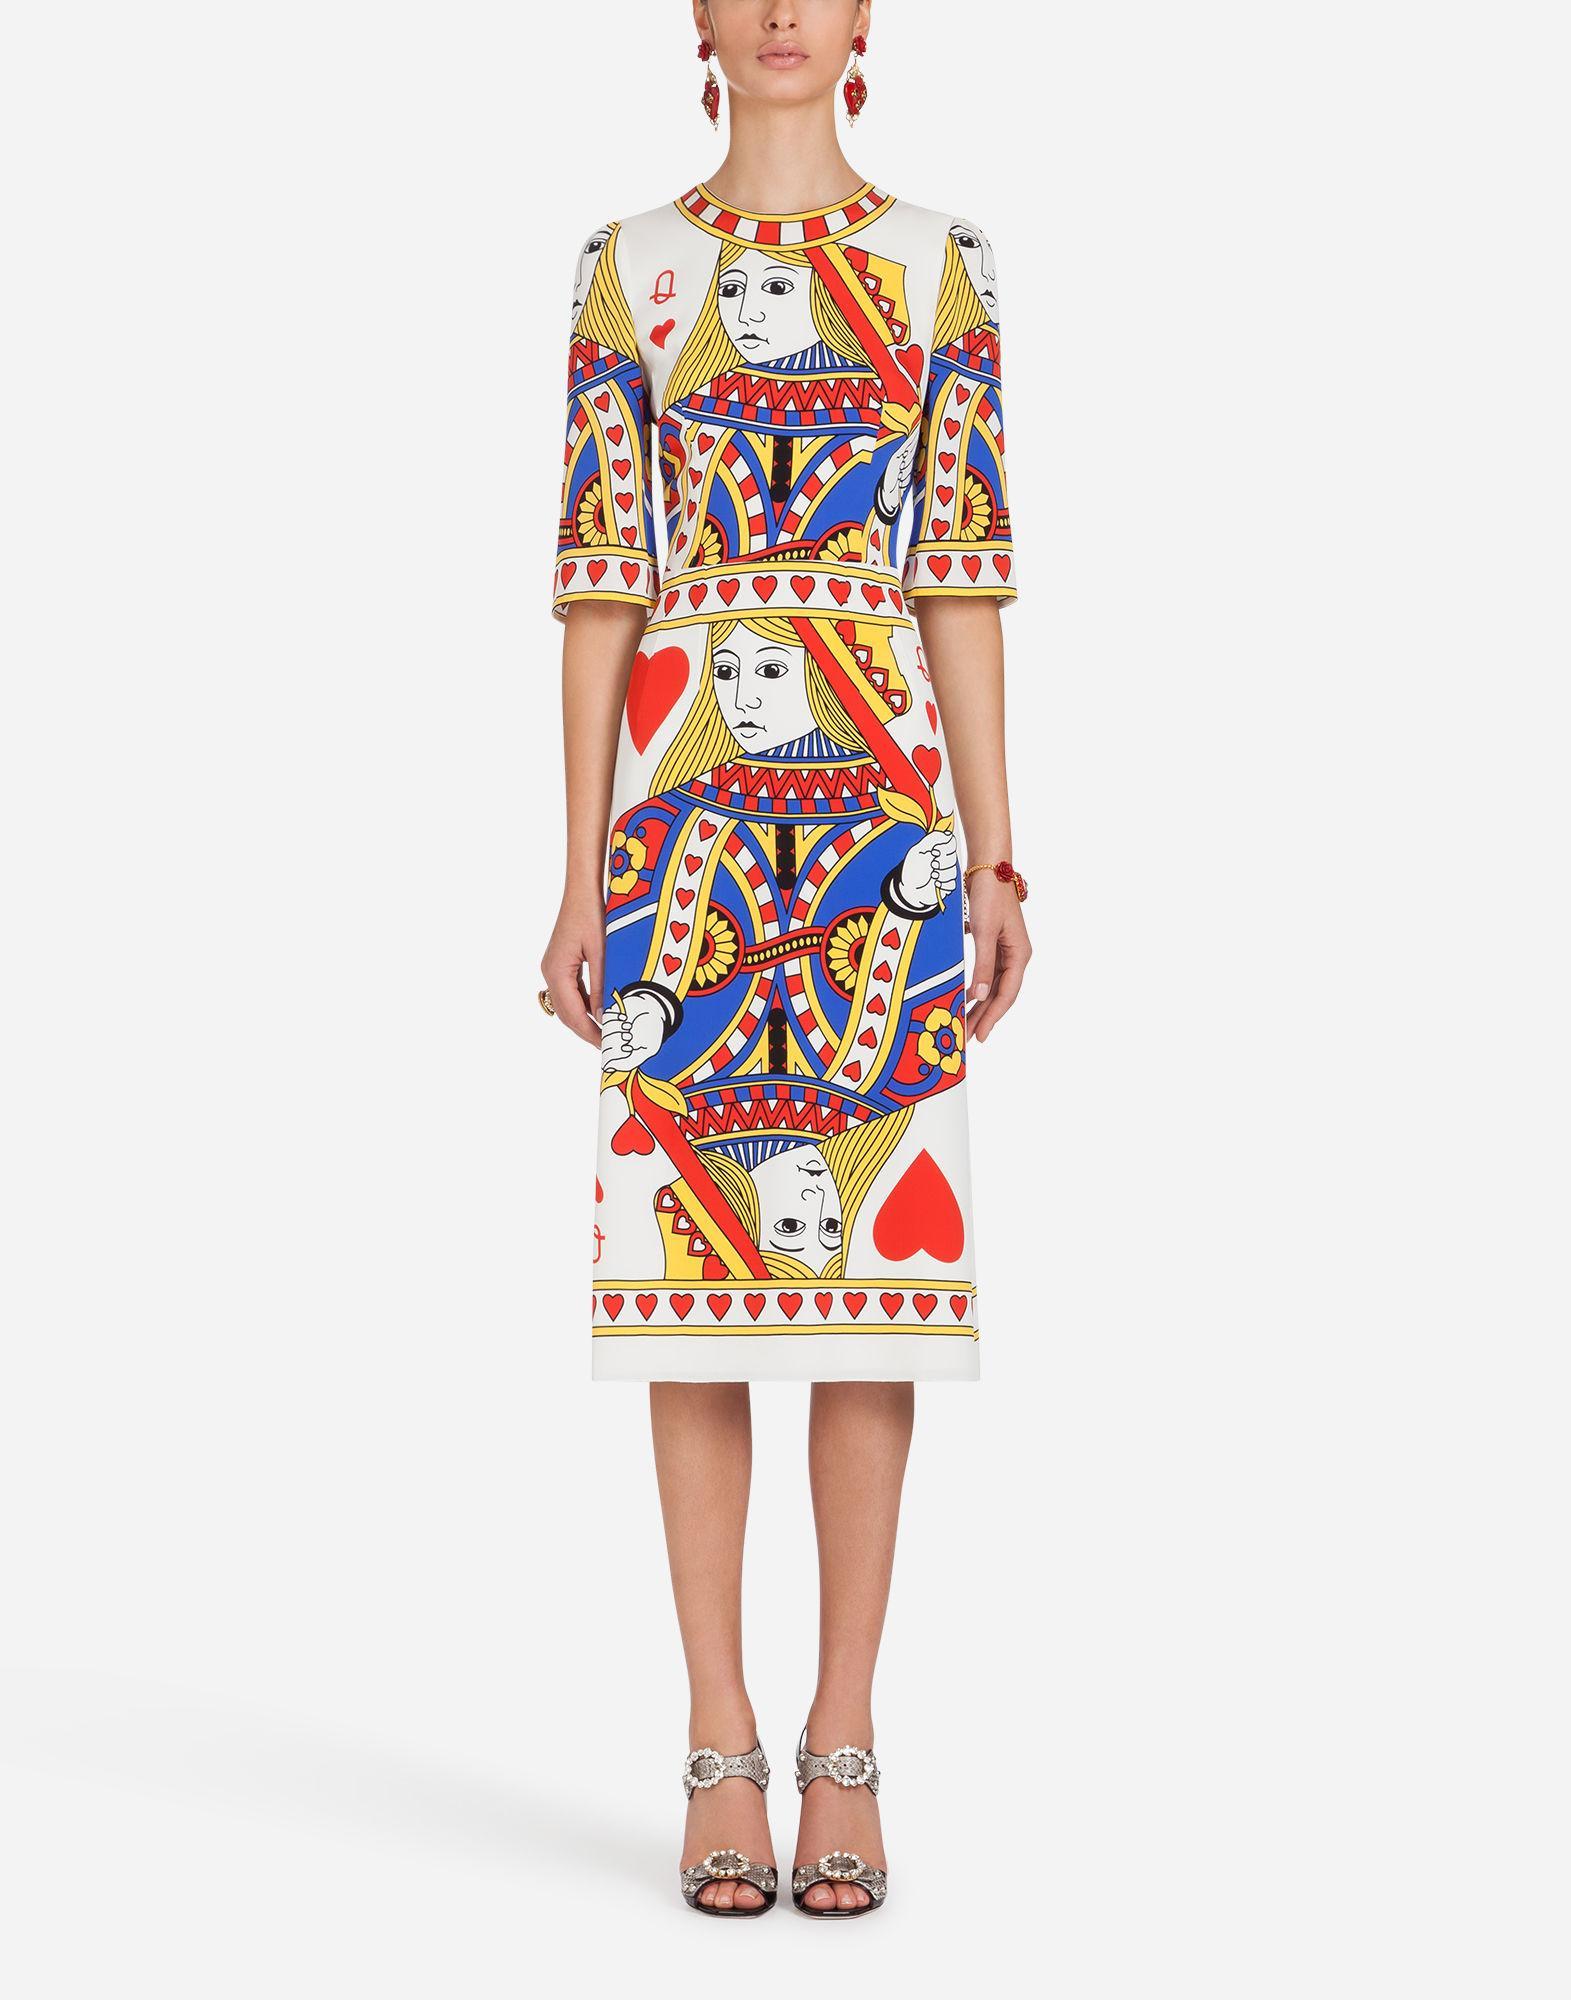 Dolce & Gabbana Printed Silk Dress In Cream